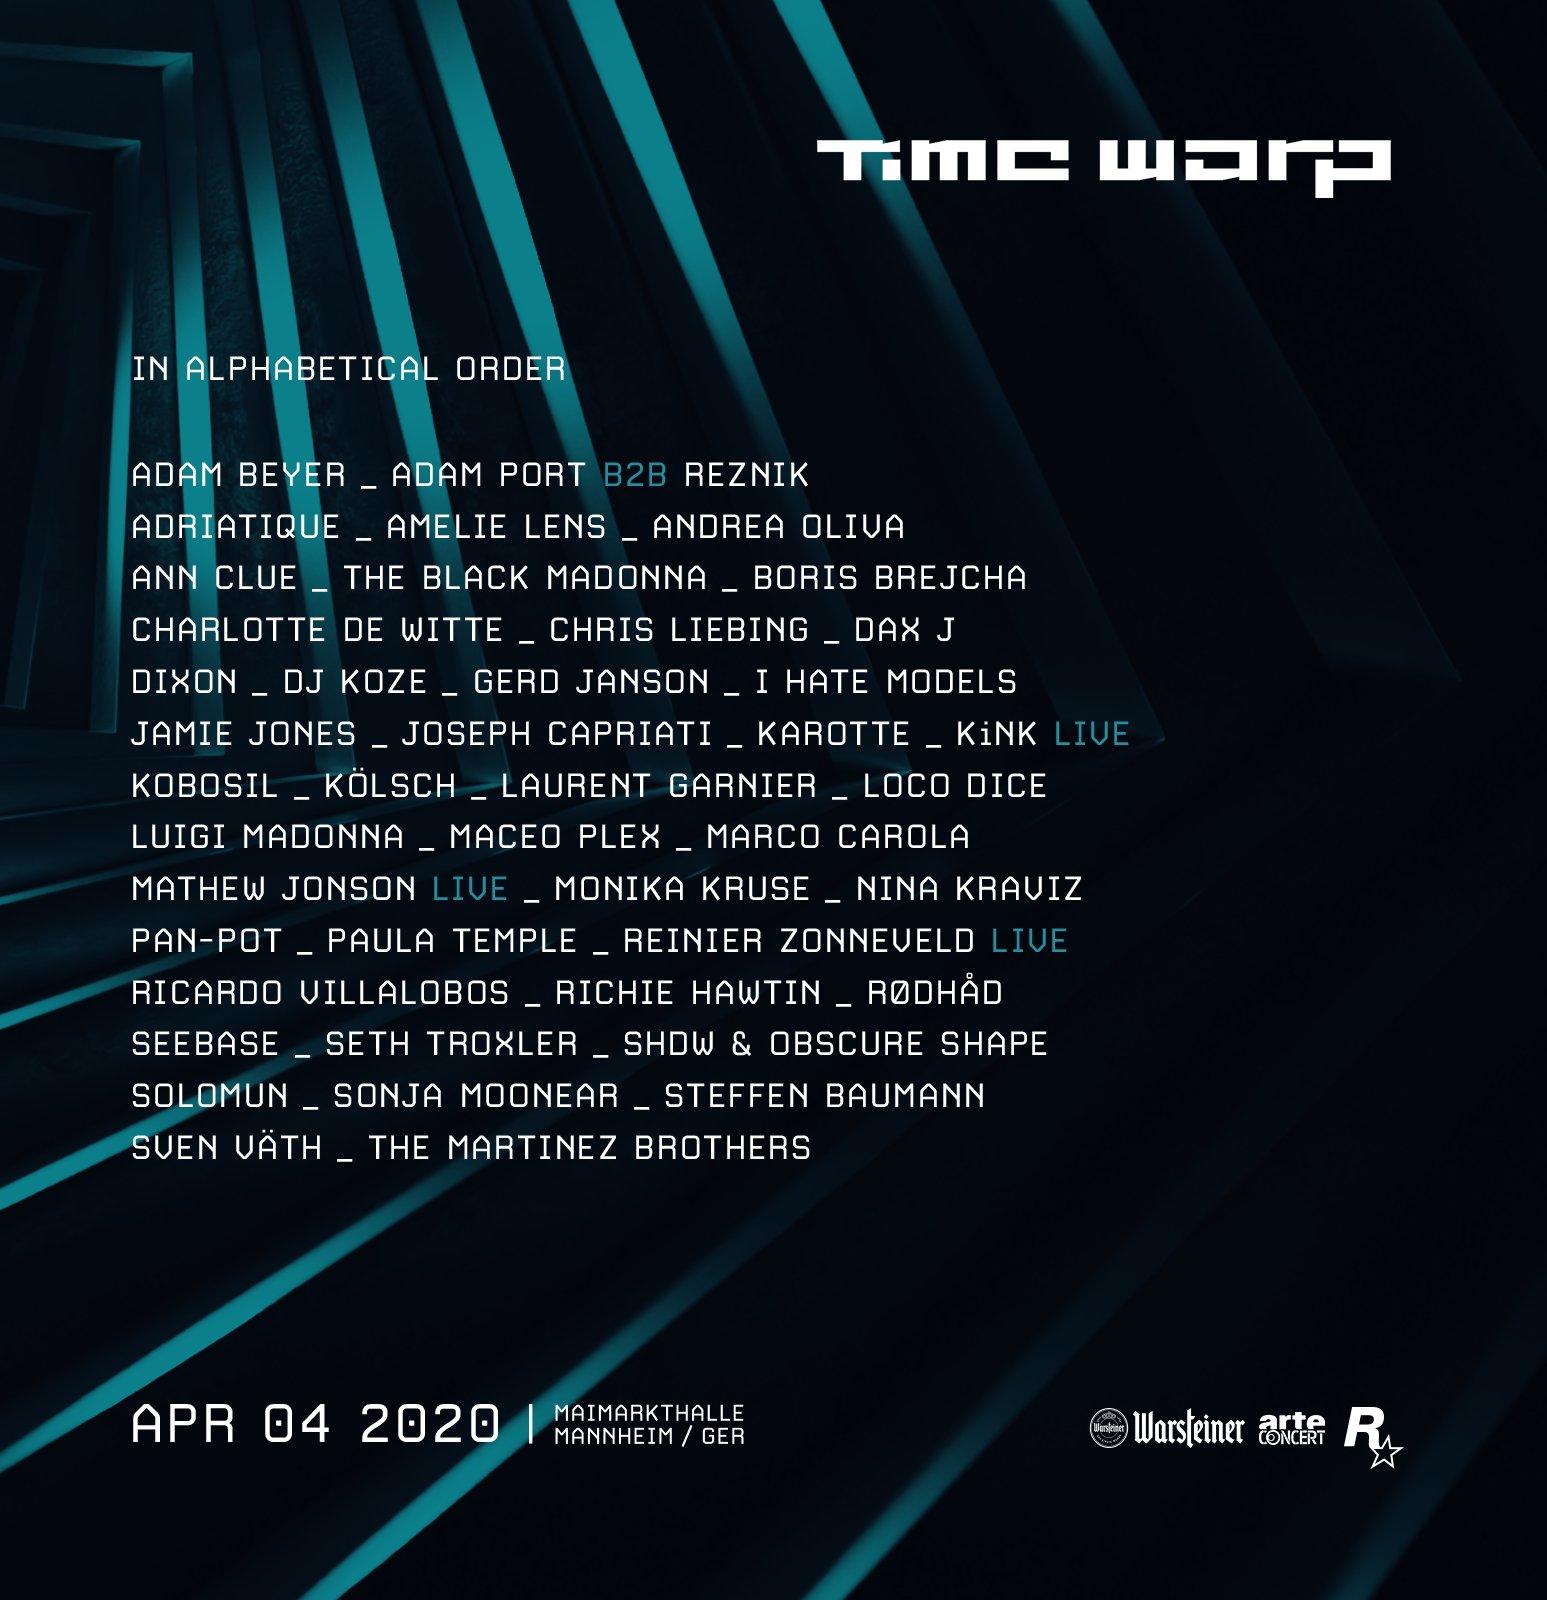 Time Warp 2020 Lineup